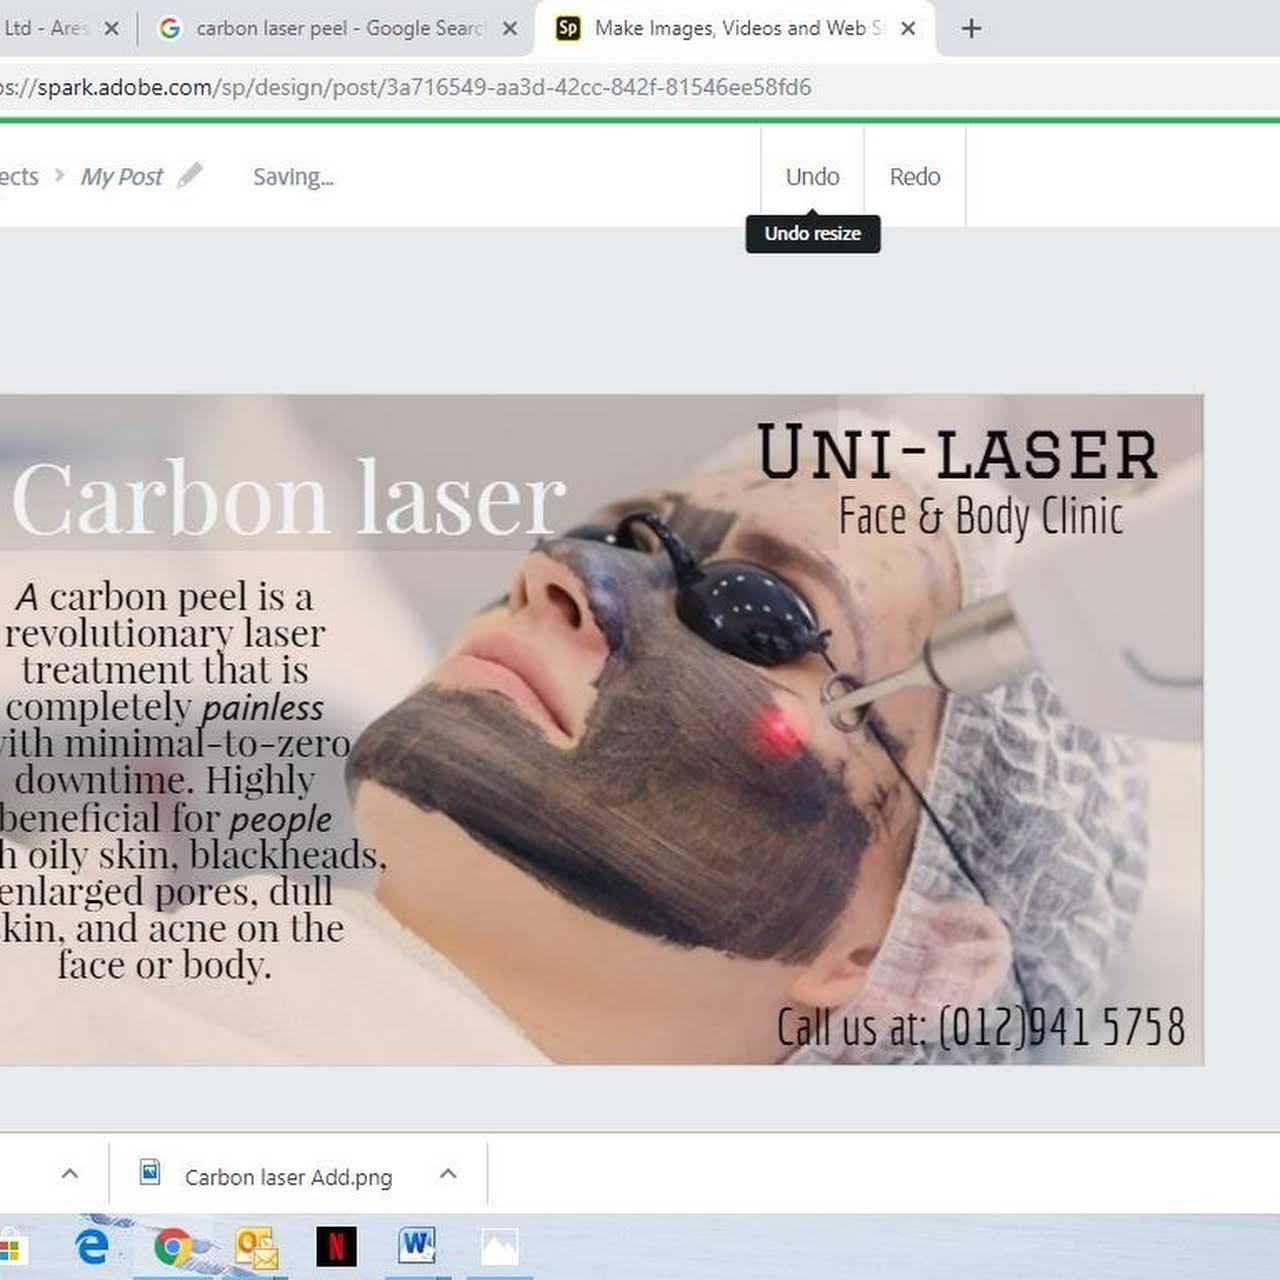 Uni-Laser Face & Body Clinic - Beauty Clinic in Sinoville